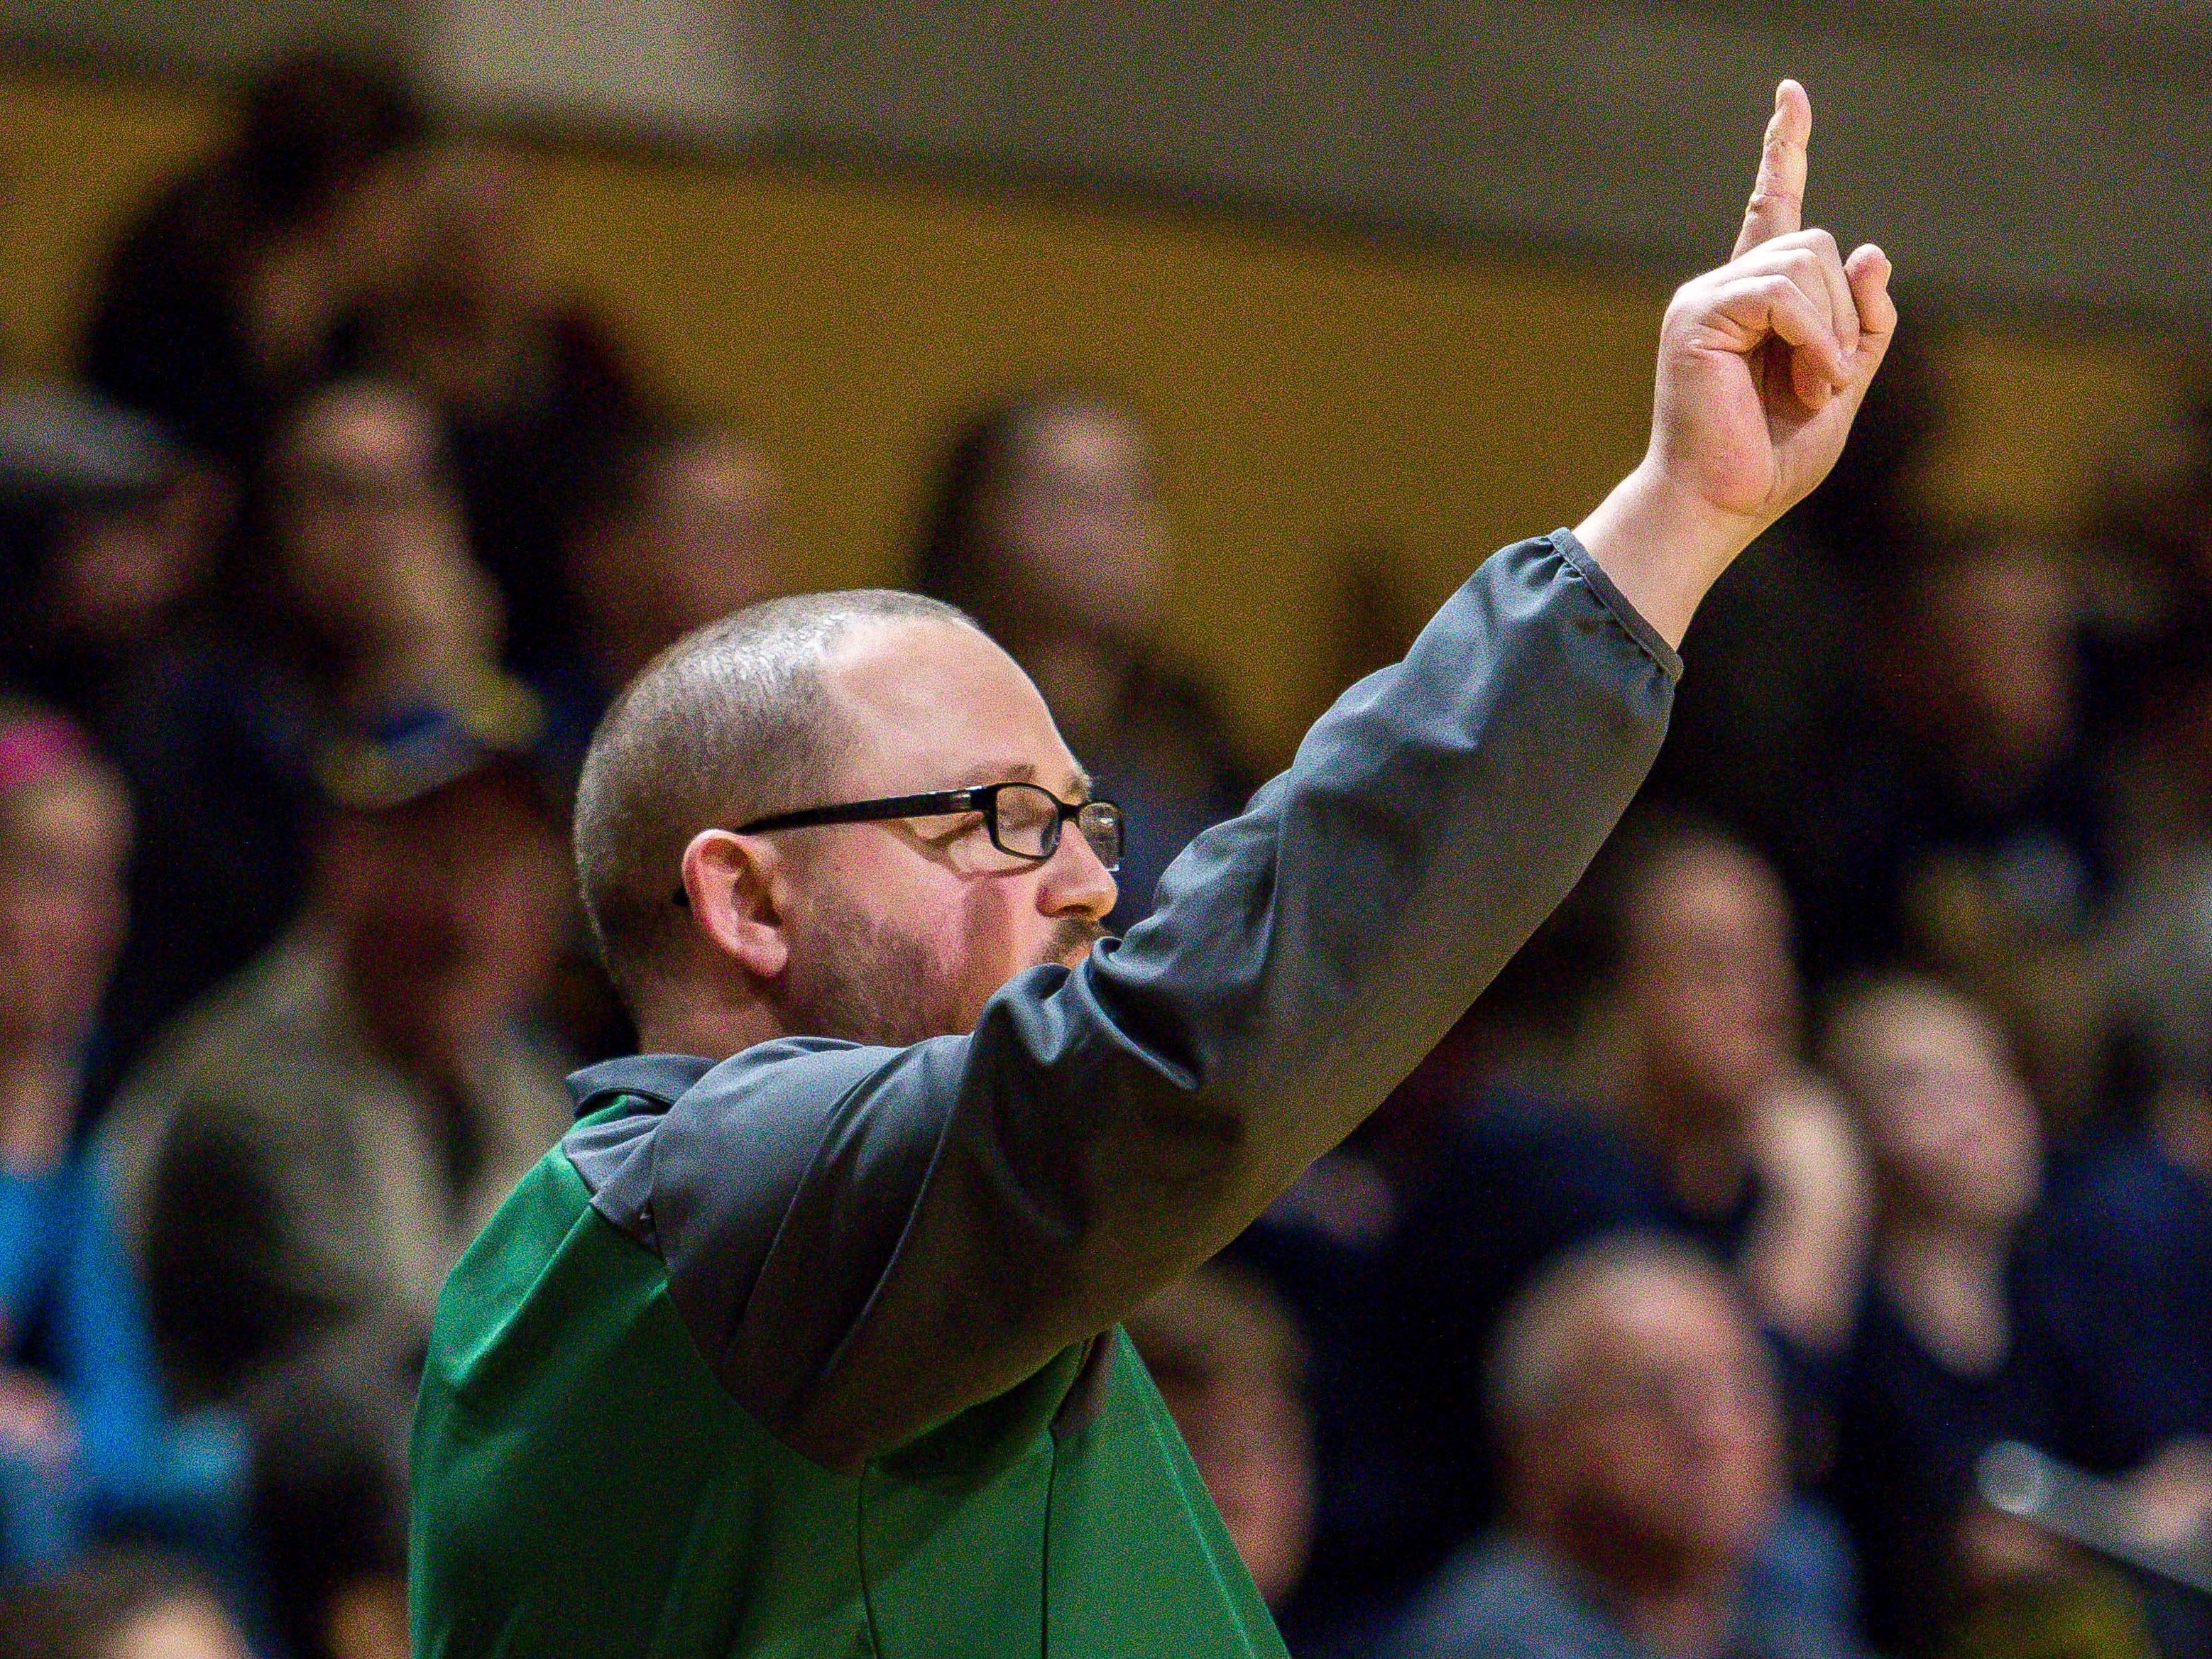 Ypsilanti Arbor Prep Head Coach Scott Stine calls a play in the first half against Pewamo-Westphalia.